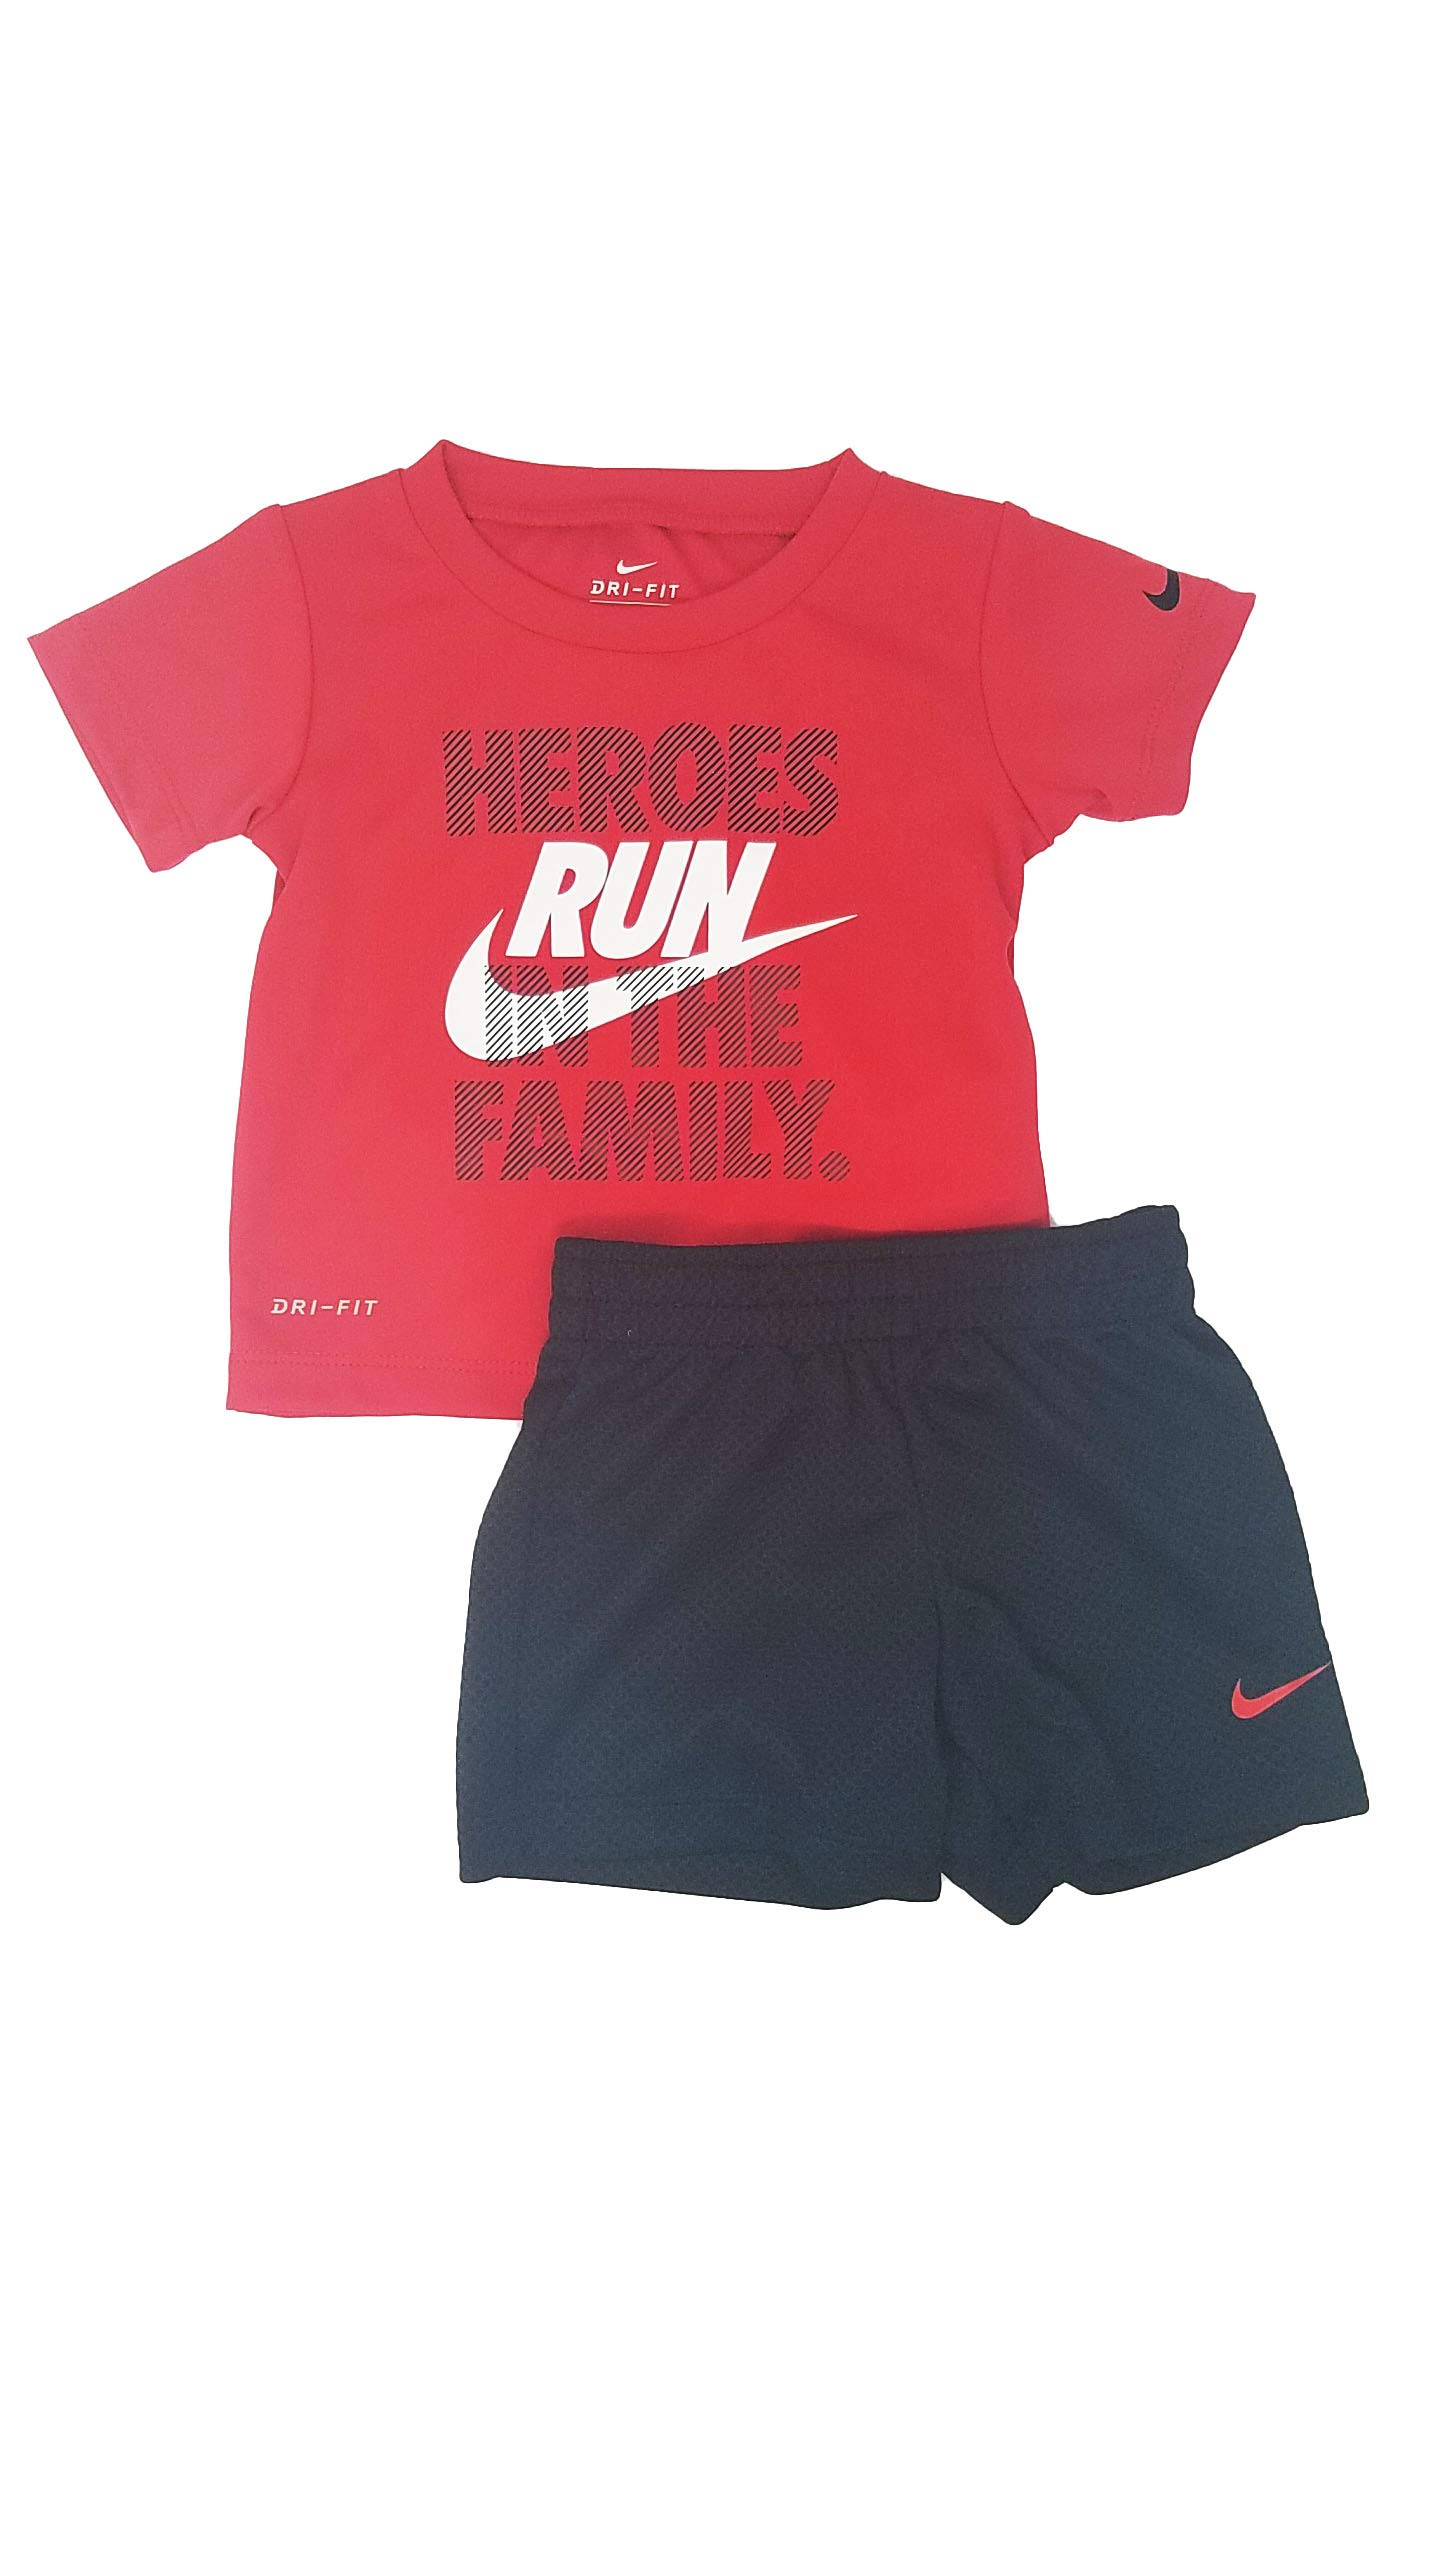 Nike Toddler Boys Dri Fit Short Sleeve T-Shirt and Short 2 Piece Set (Black (66E906-203)/White, 12 Months)